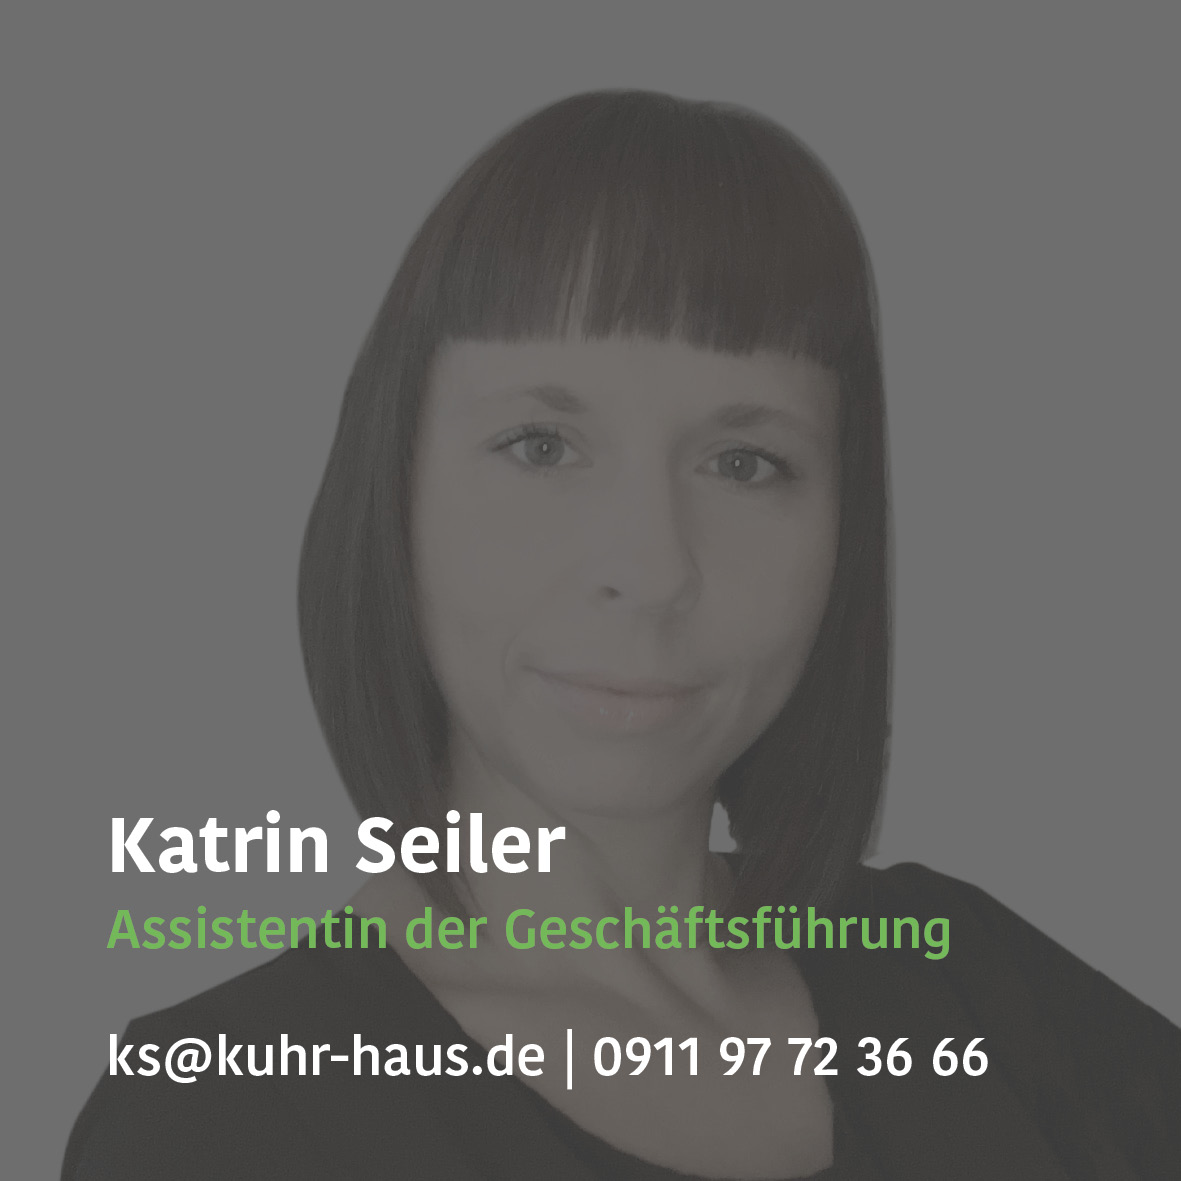 Kuhrhaus_Seiler_kontakt